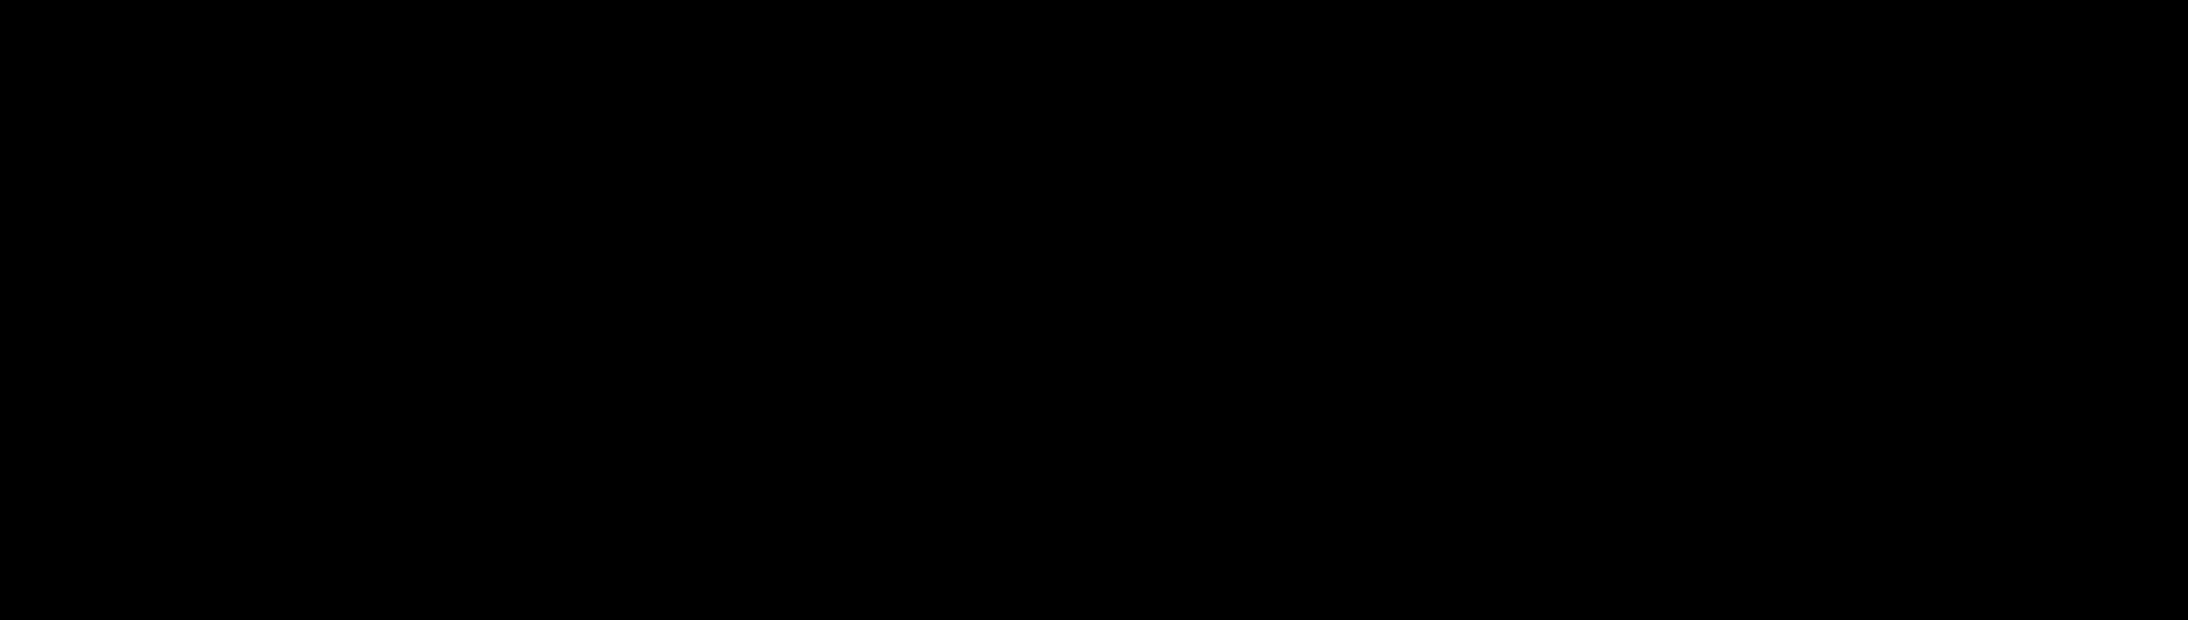 6-Amino-N-(4-((2-amino-9H-purin-6-yloxy)methyl)benzyl)hexanamide